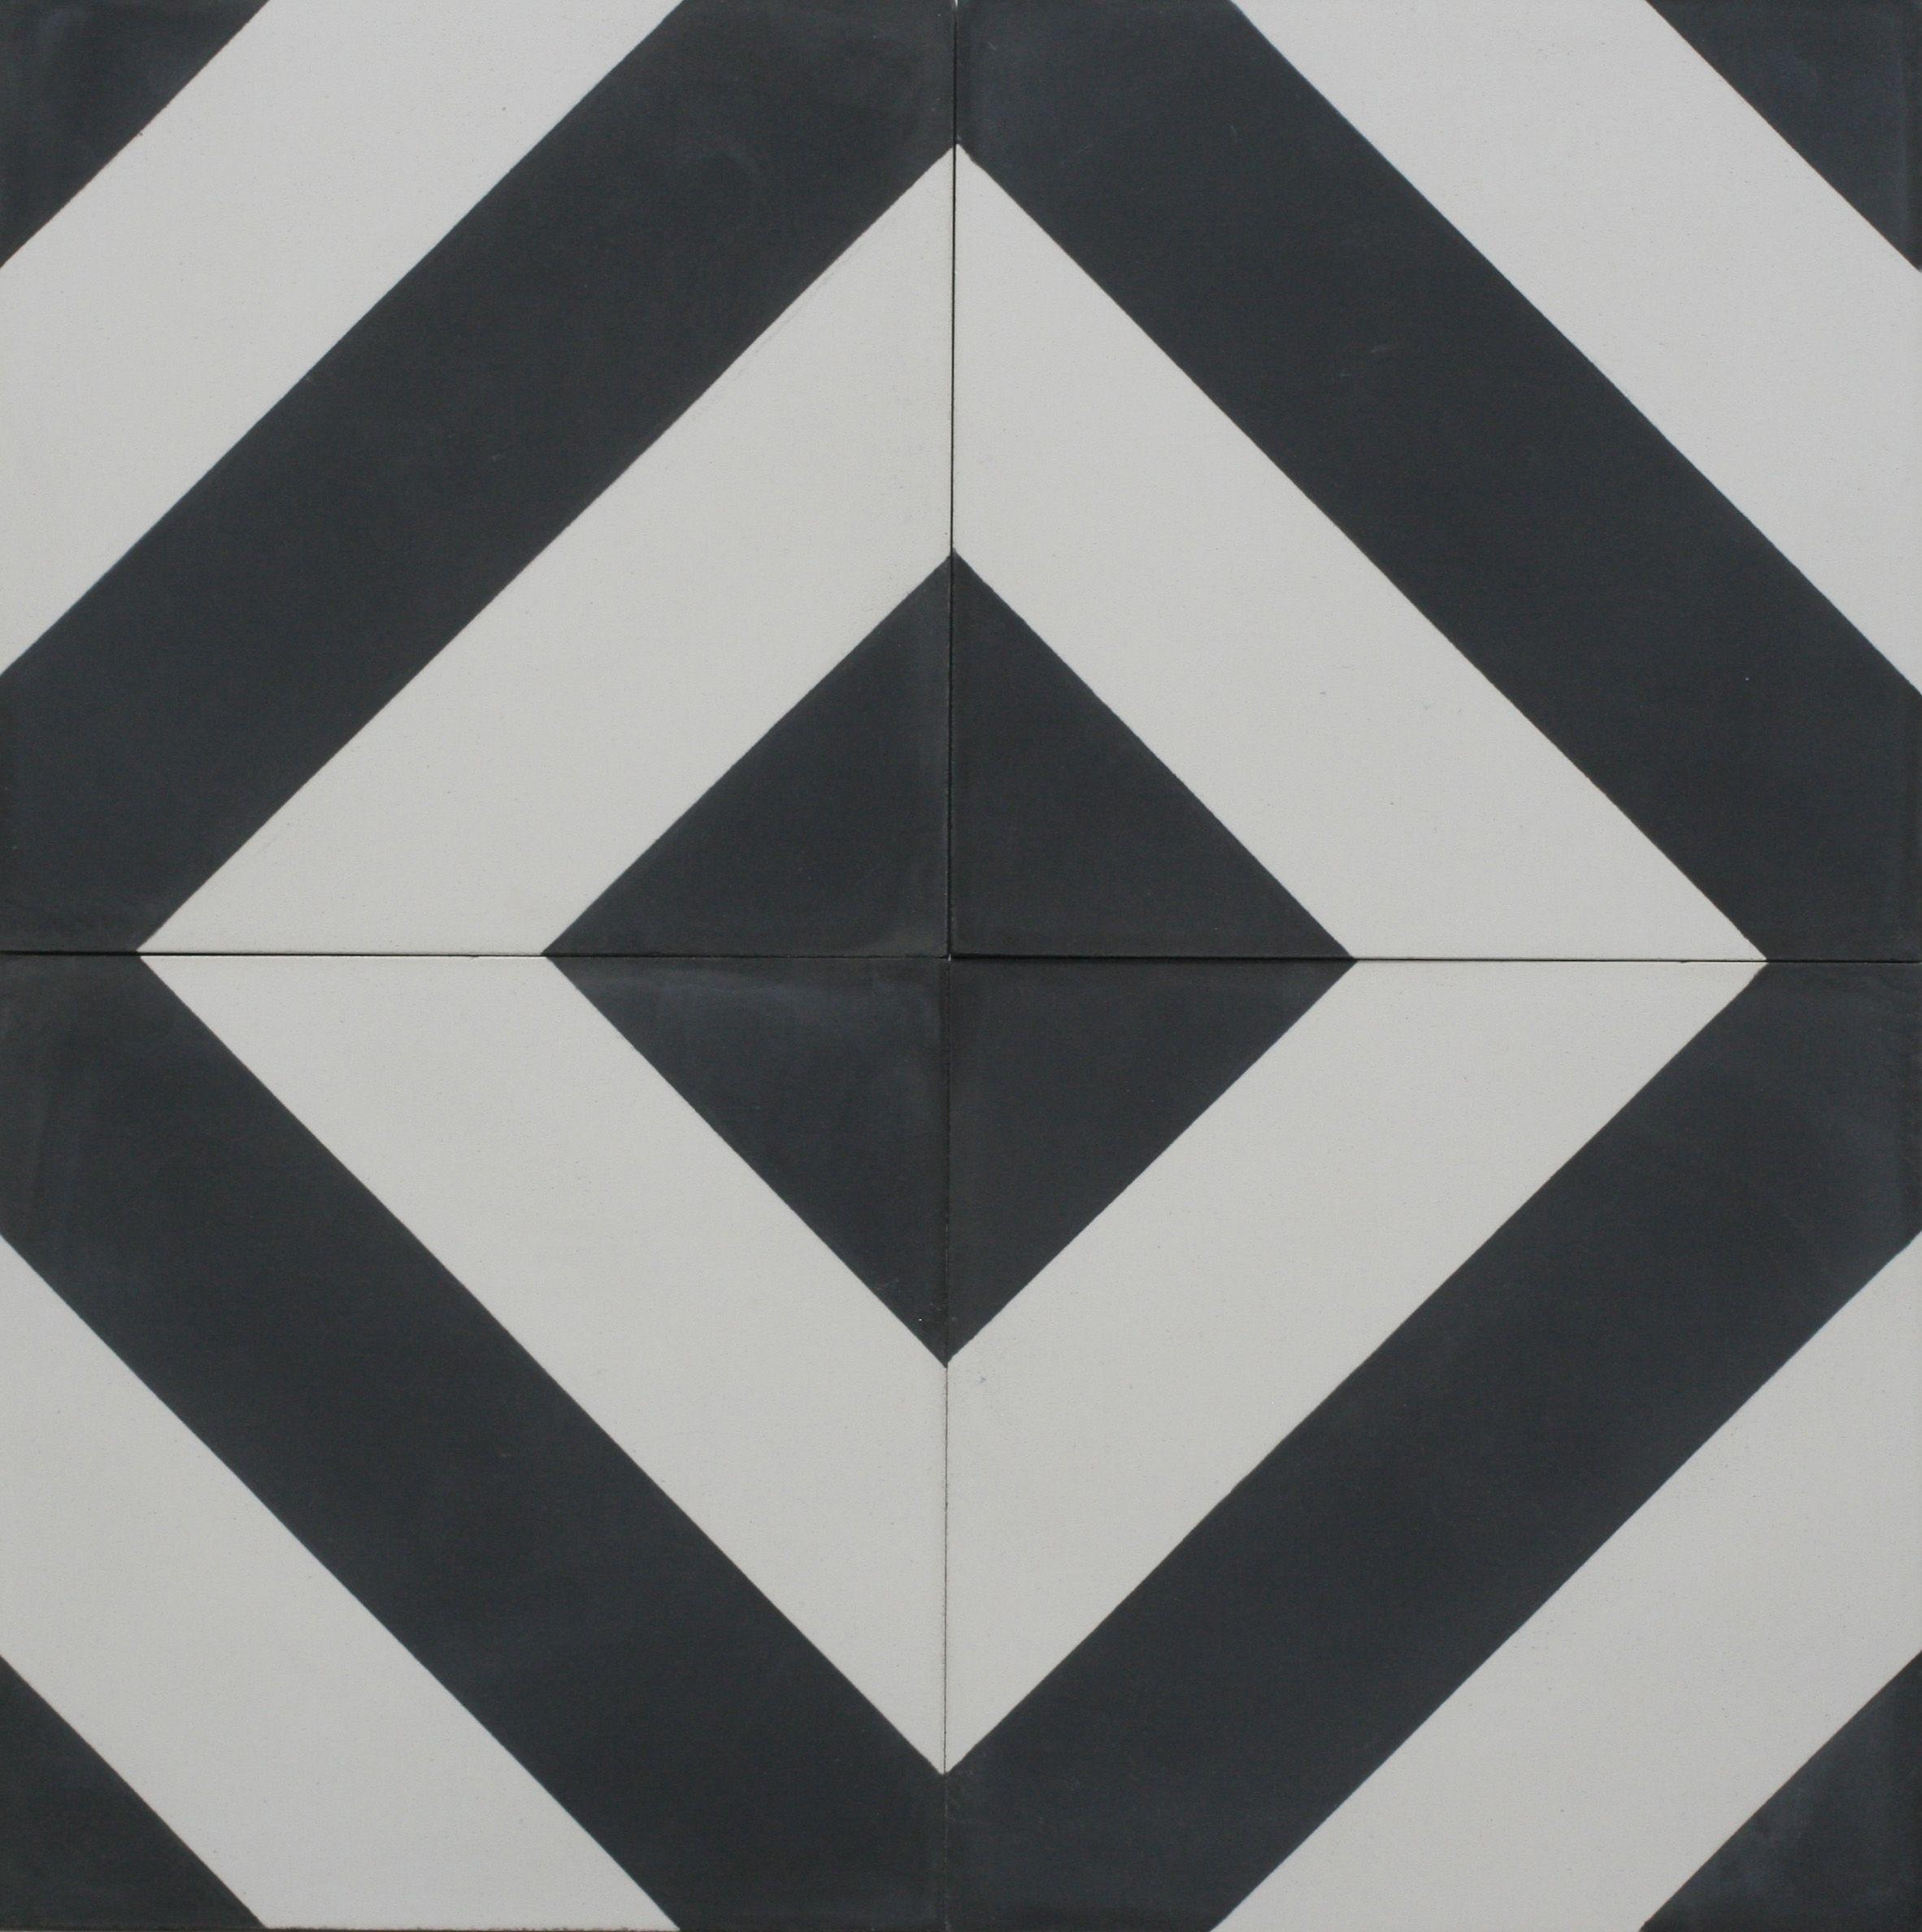 Diagonal Black & White Encaustic Cement Tile Bespoke Tile and Stone